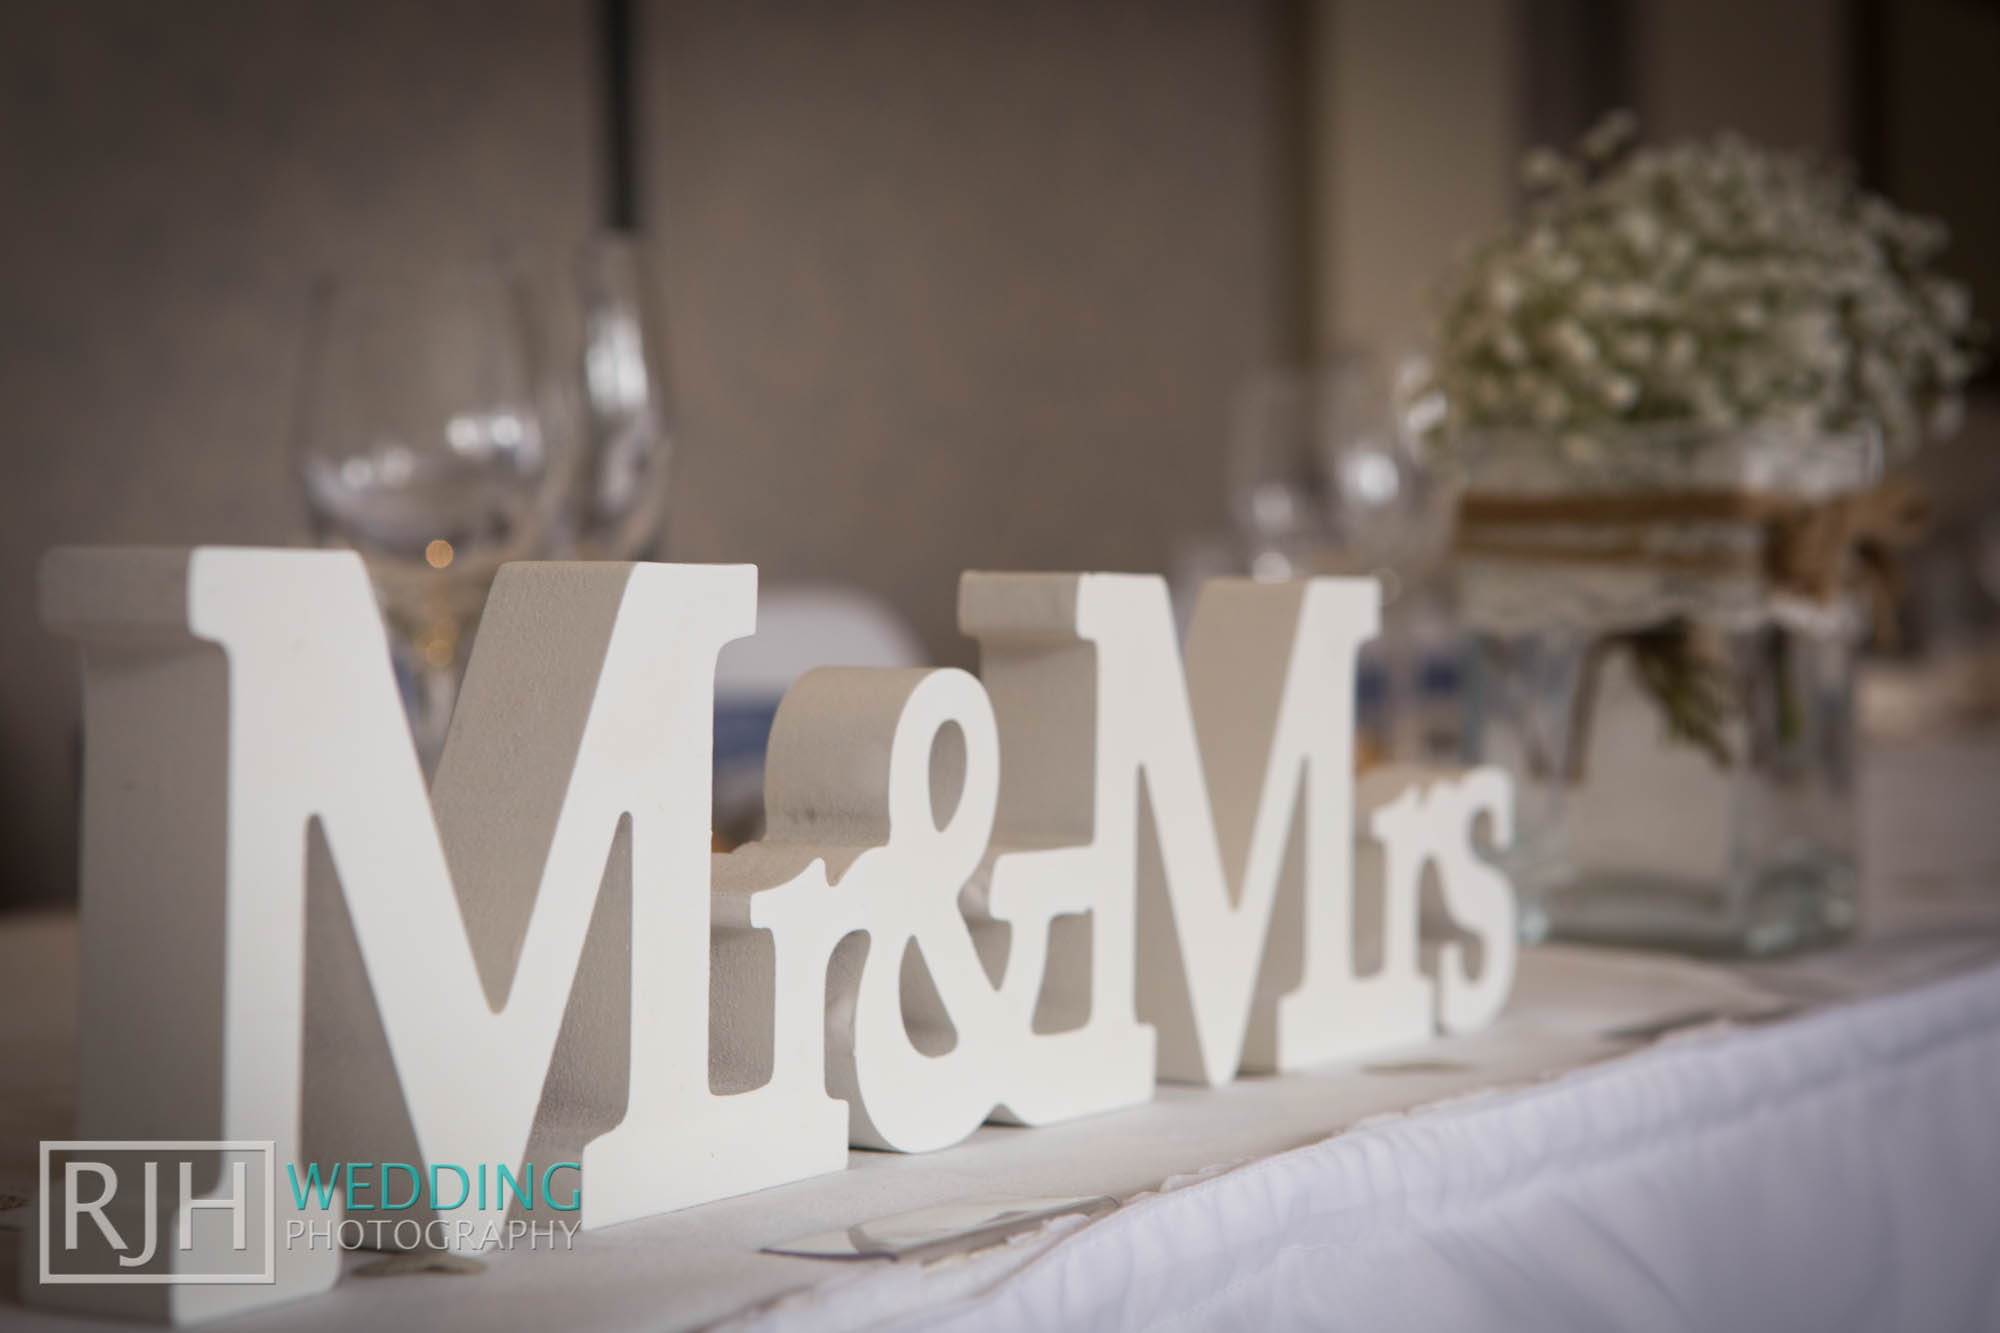 Whitley Hall Marples Wedding_23_3C2A8483.jpg